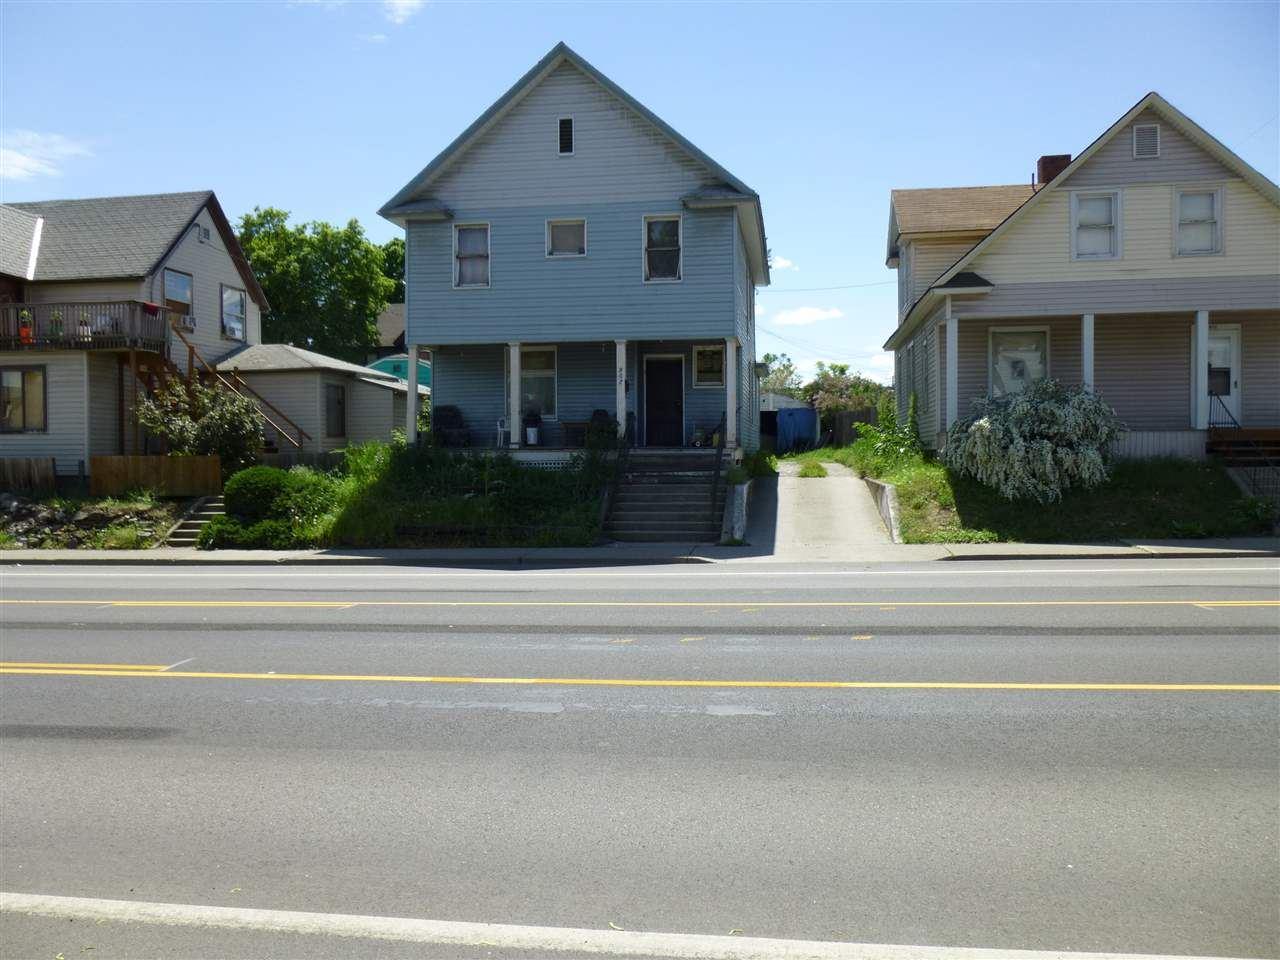 907 W Maxwell Ave, Spokane, WA 99201 - #: 202014950